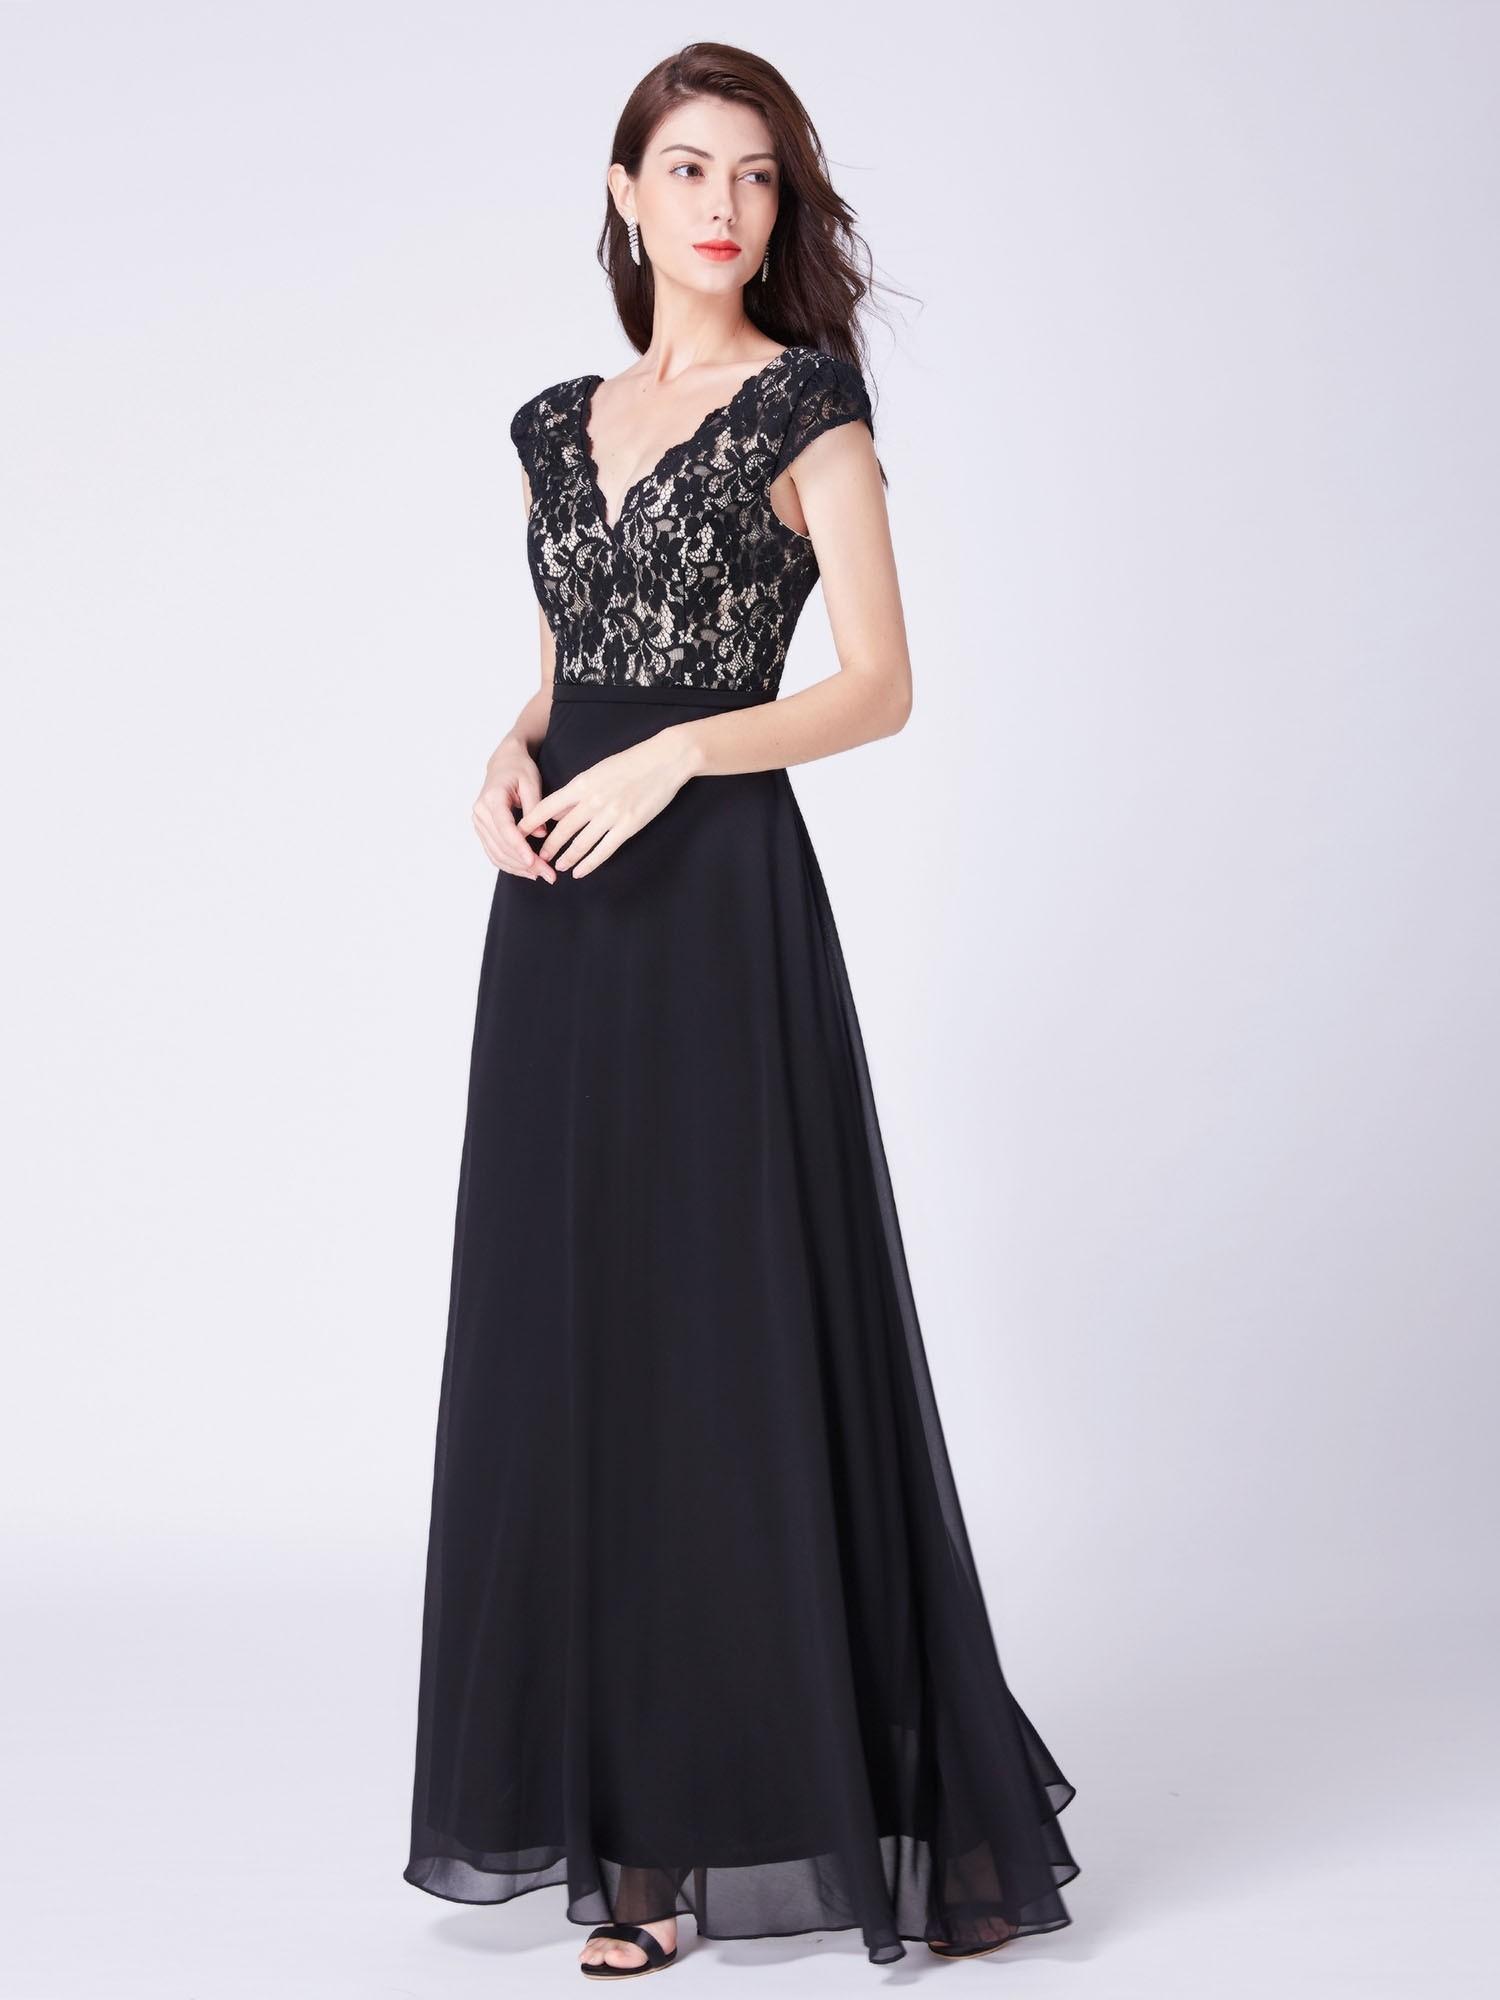 Black Long V Neck Lace Mother of The Bride Dresses